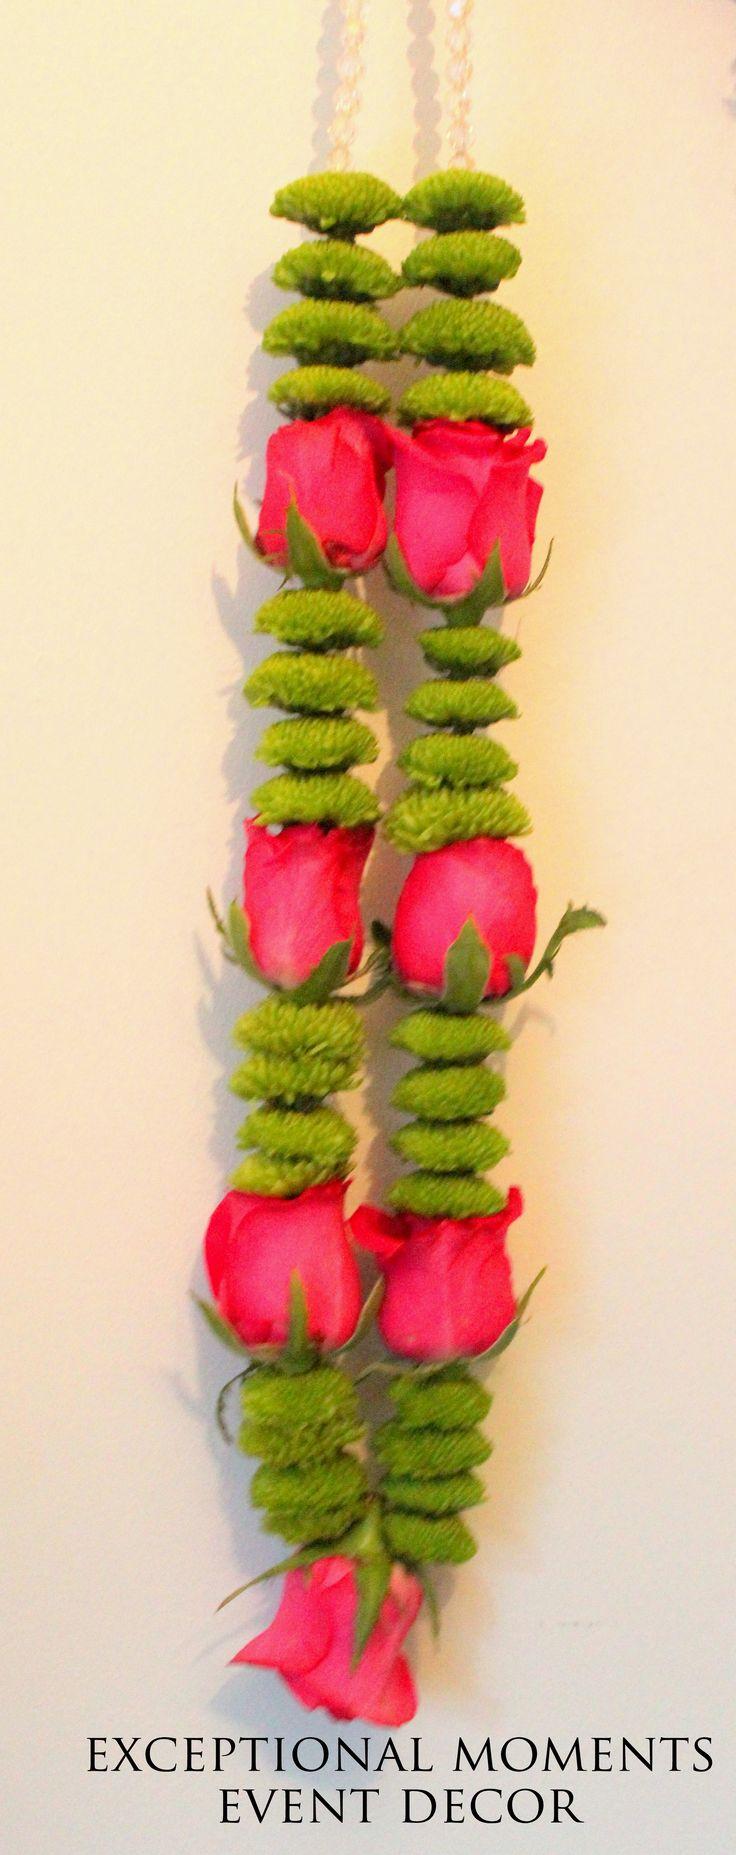 fuchsia Rose, green button chrysanthemum wedding garland